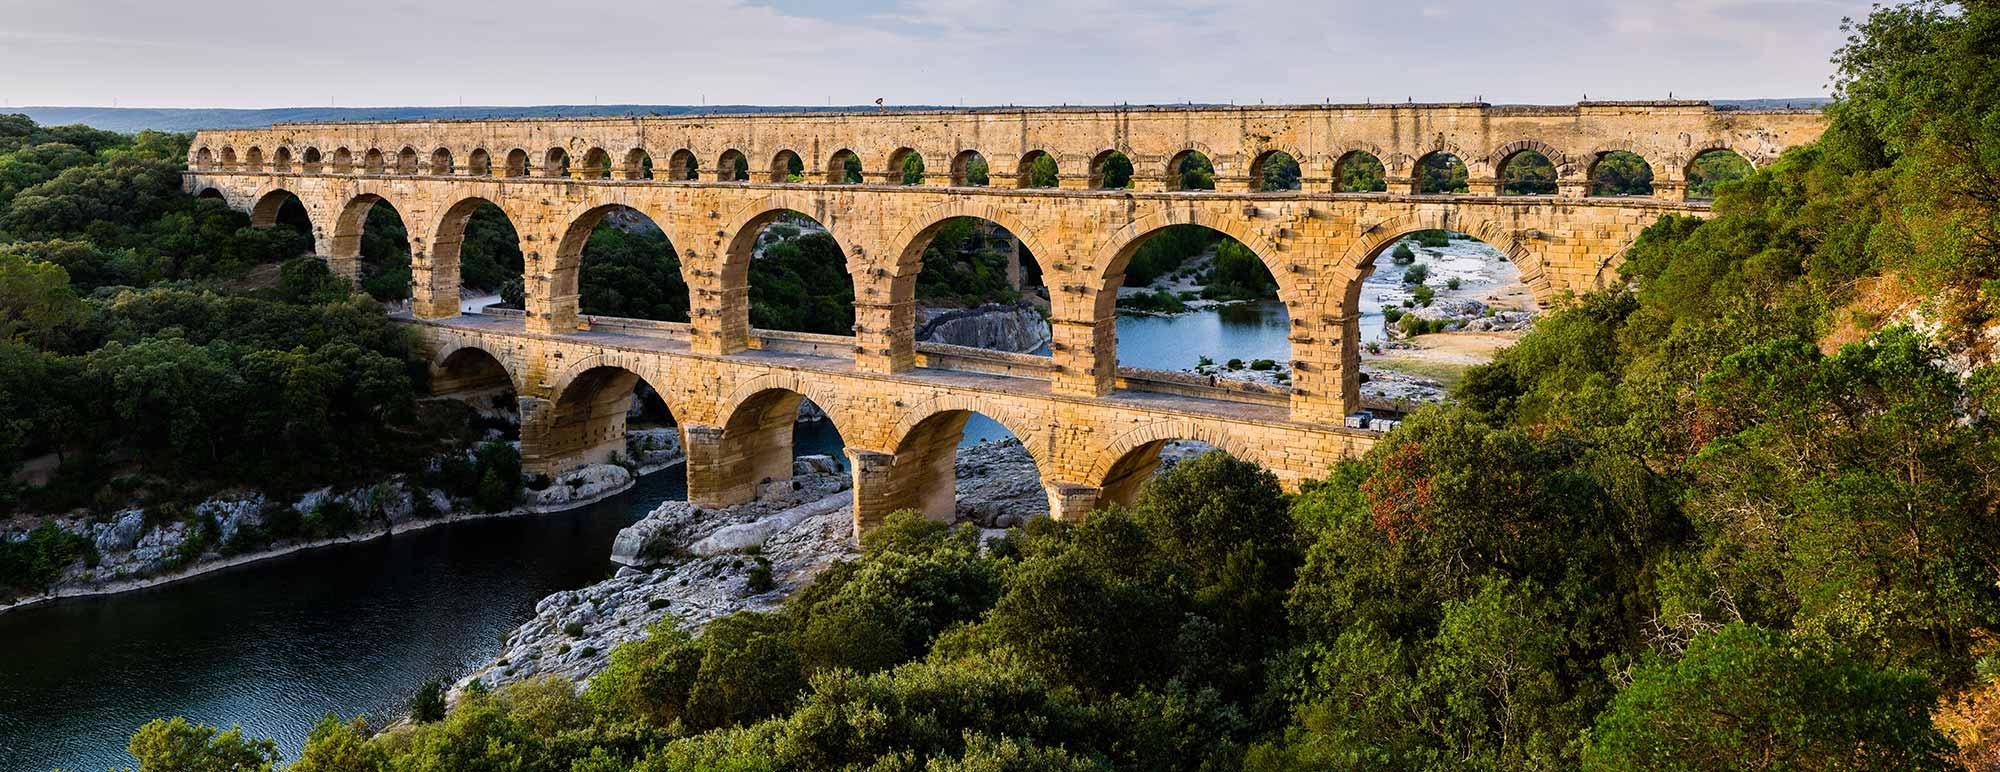 South France Pont du Gard Wikipedia